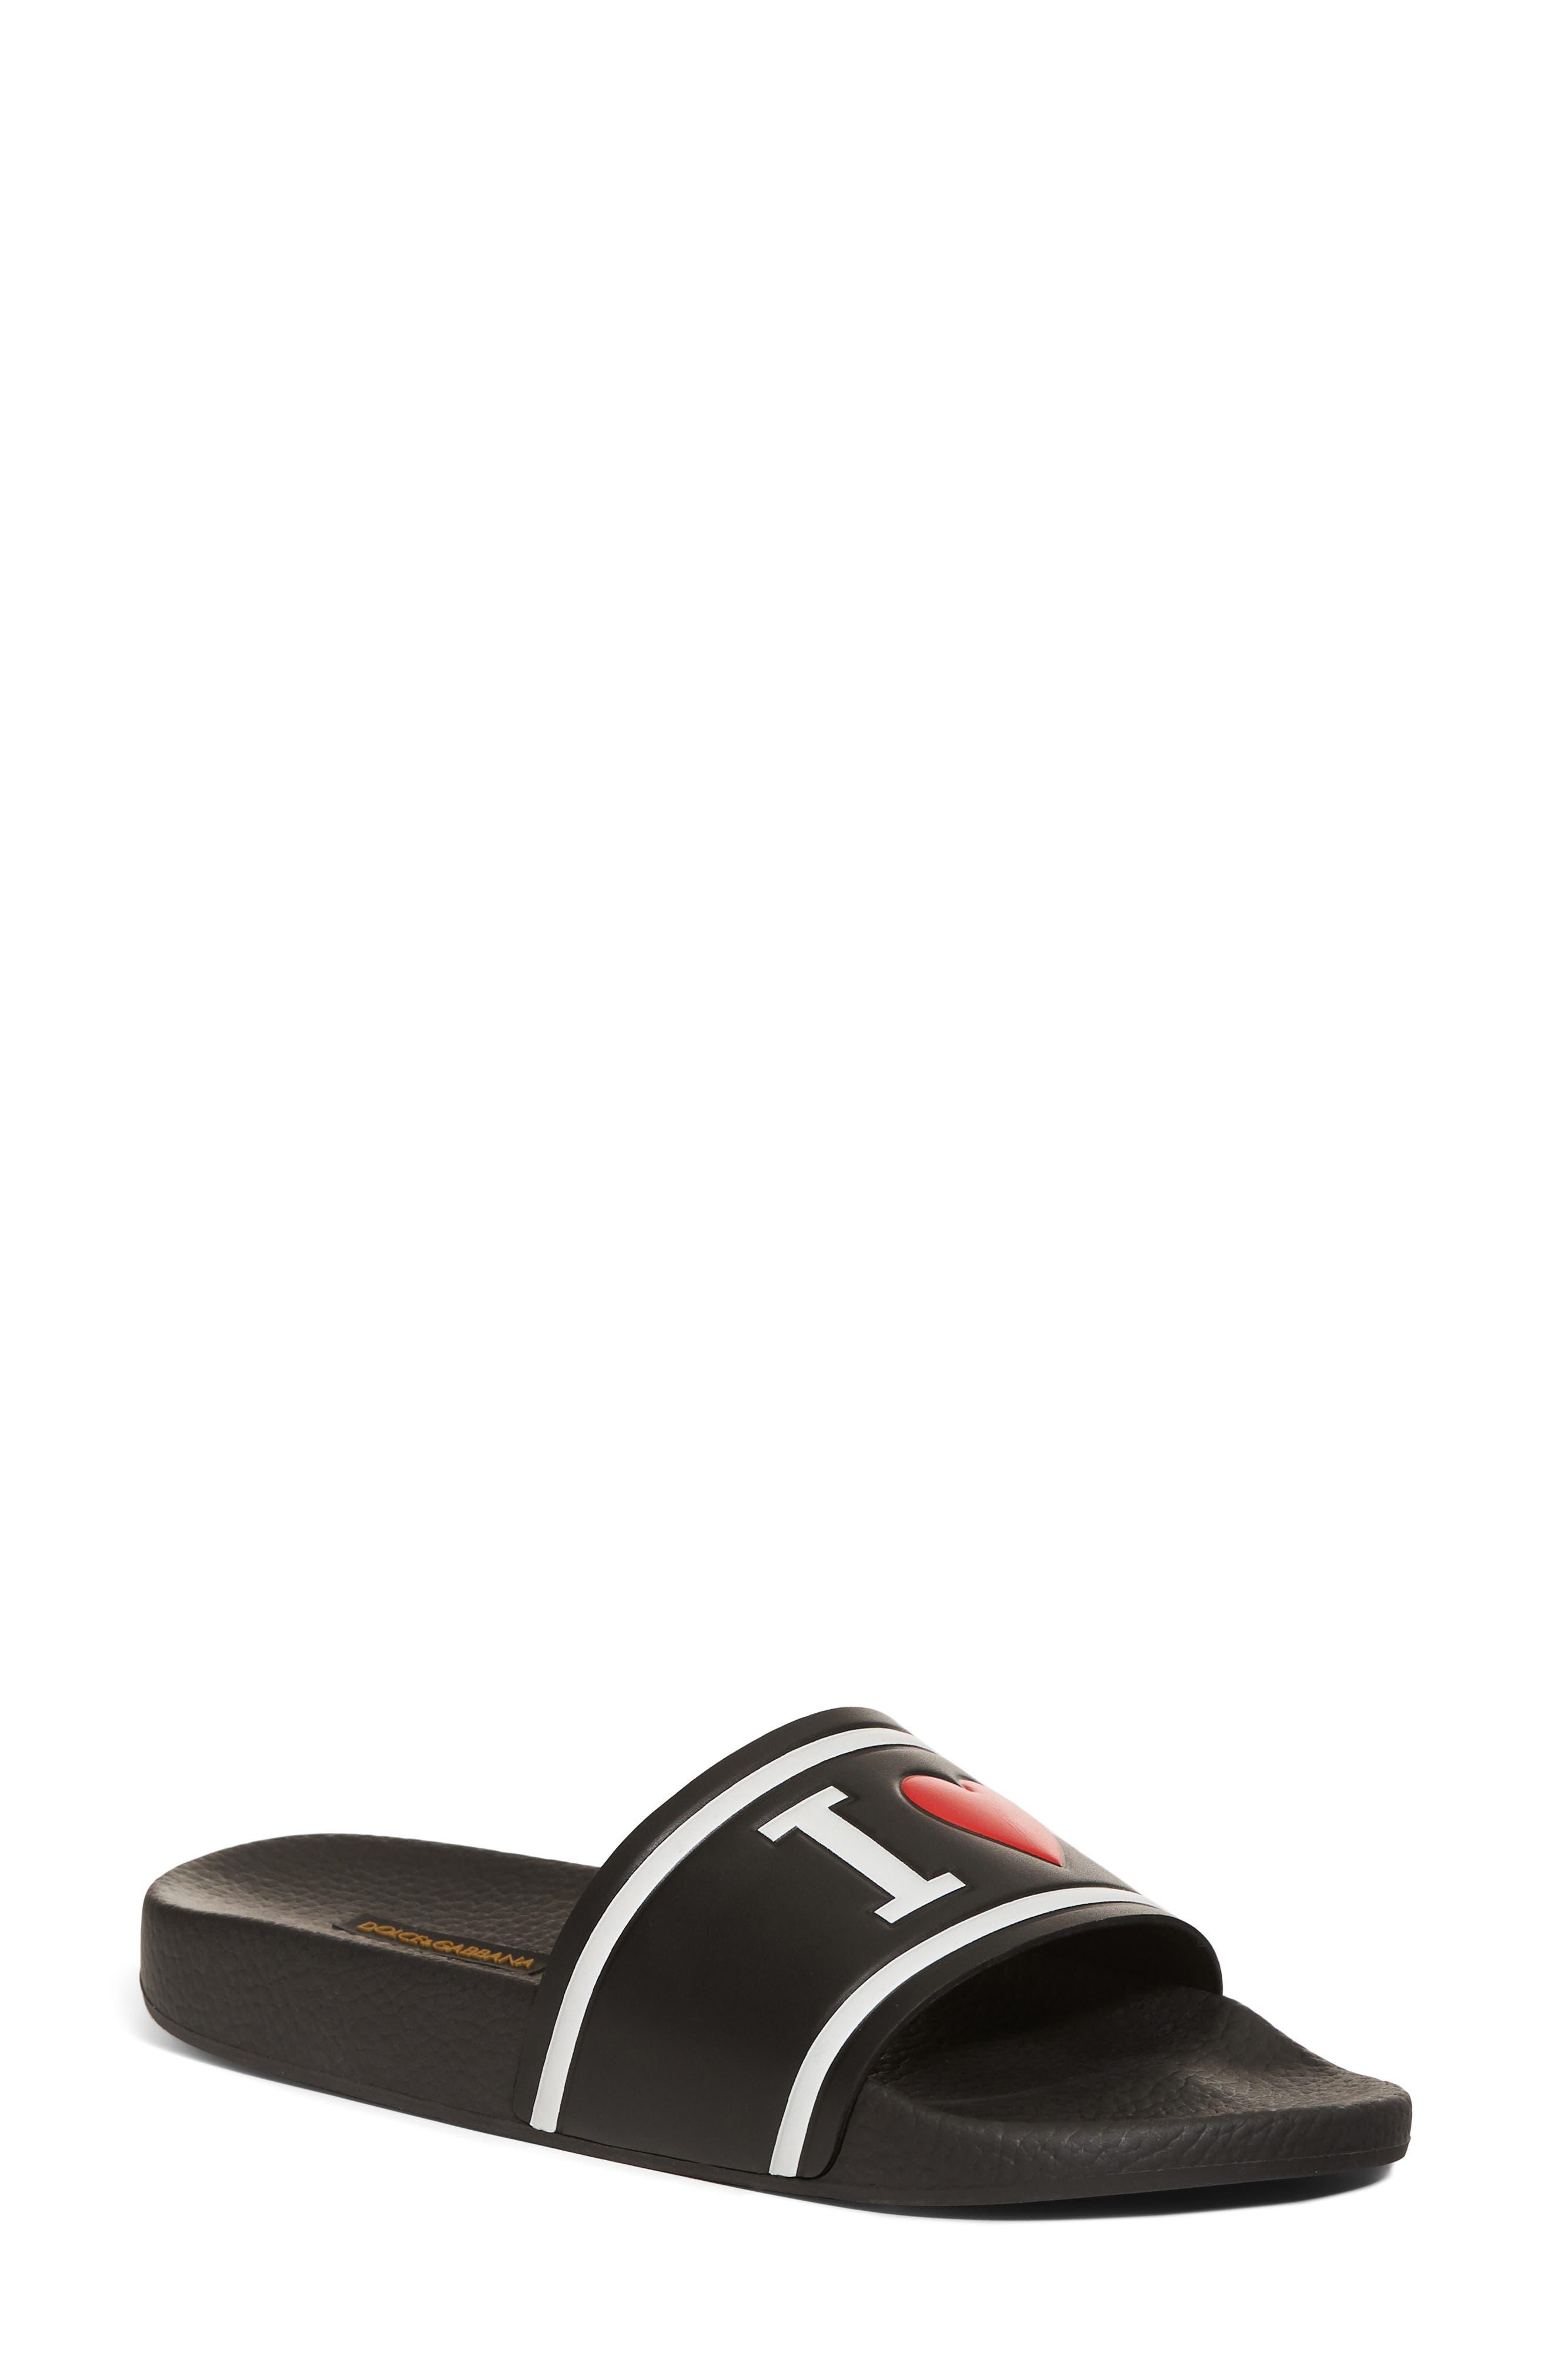 I Love DG Slide Sandal,                             Main thumbnail 1, color,                             BLACK